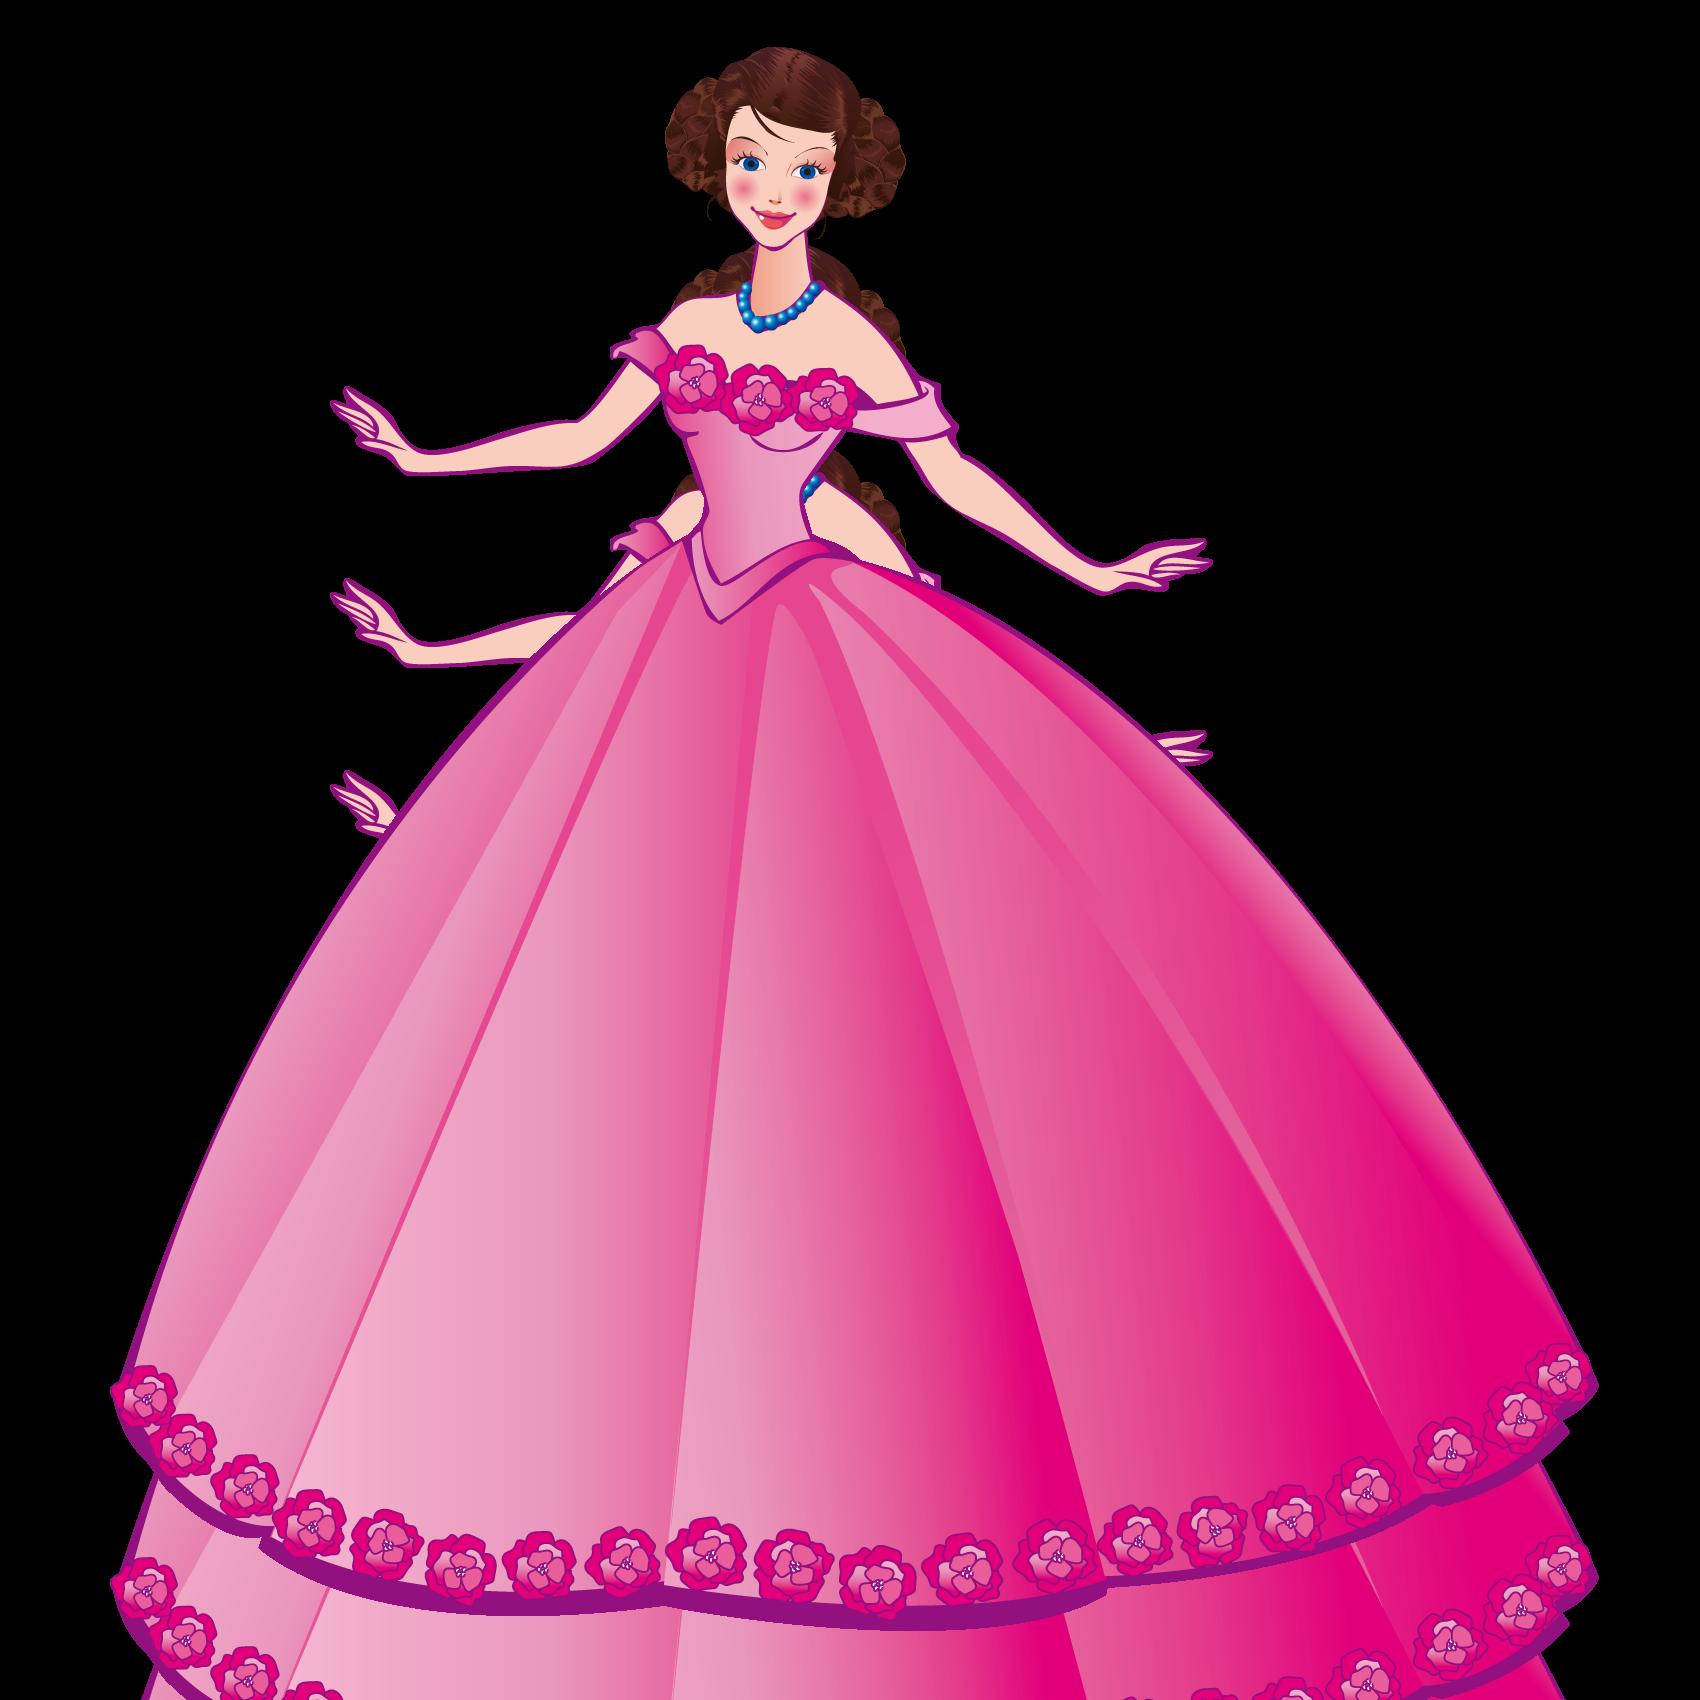 Coloriage princesse imprimer - Images princesse ...